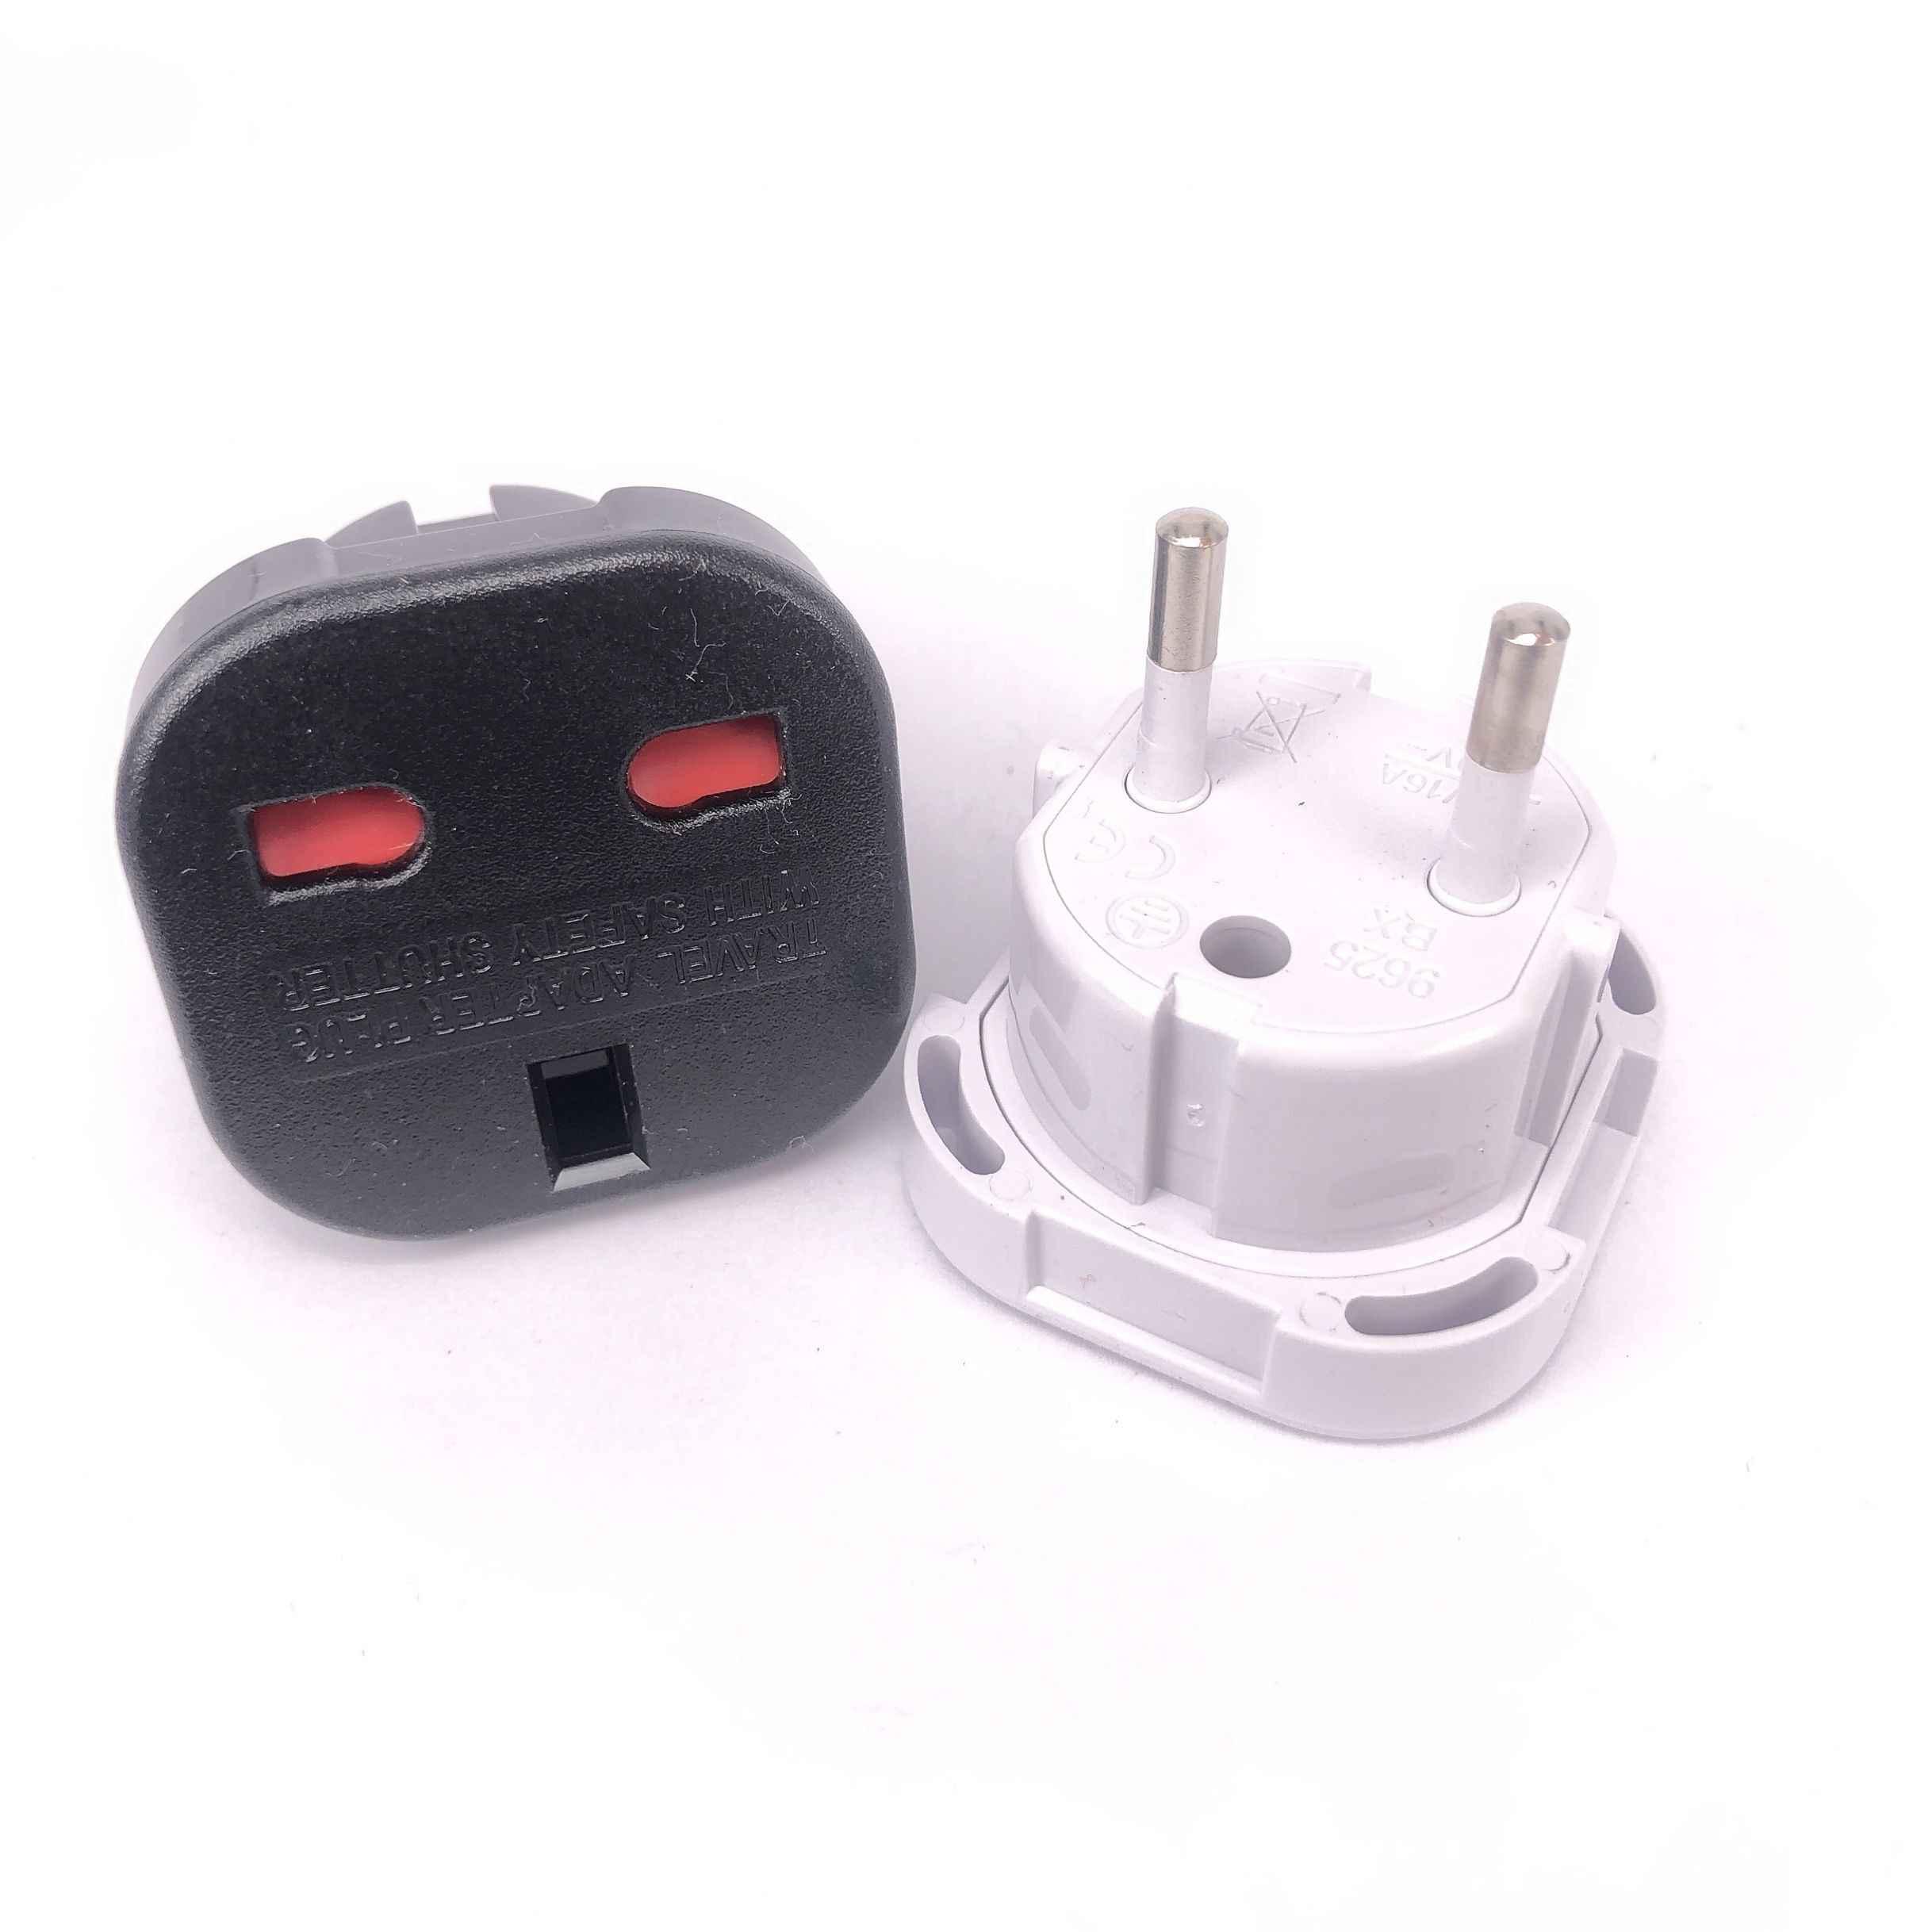 1 Stuks Nieuwe Reizen Uk Naar Eu 240V Adapters Hoge Kwaliteit Euro Plug Ac Power Charger Adapter Converter Socket zwart Mayitr